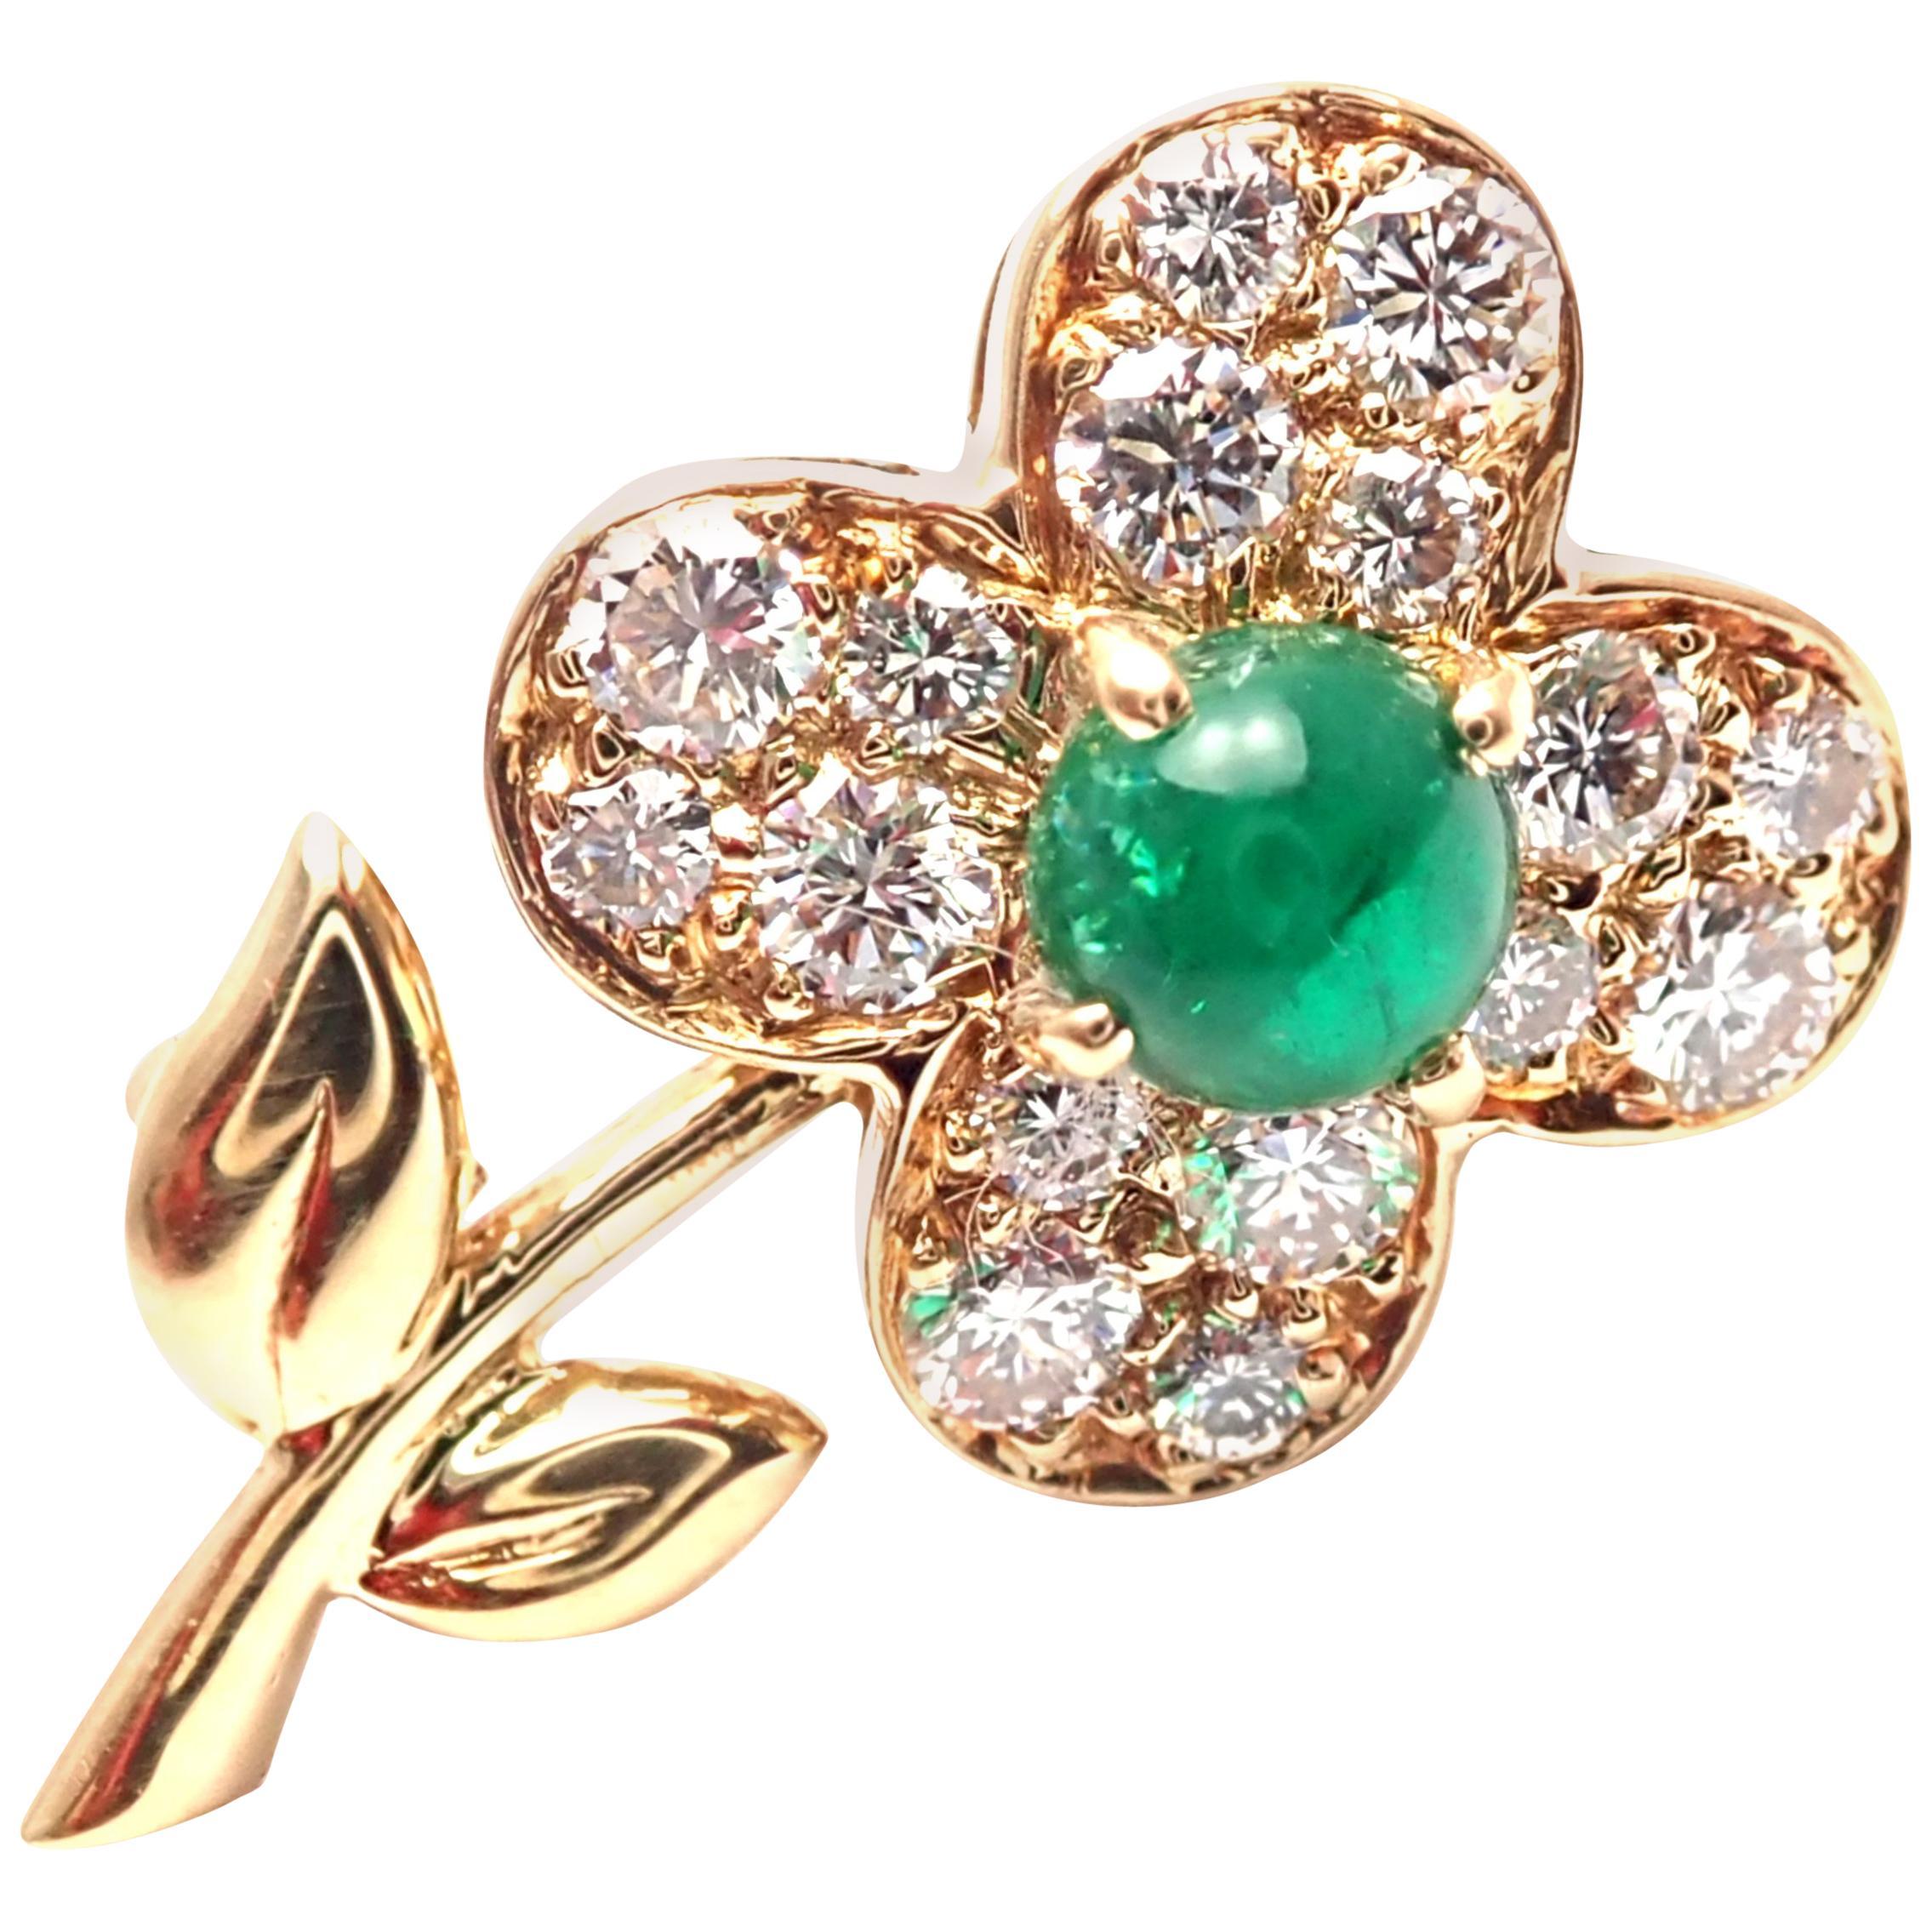 Van Cleef & Arpels Diamond Emerald Flower Yellow Gold Pin Brooch